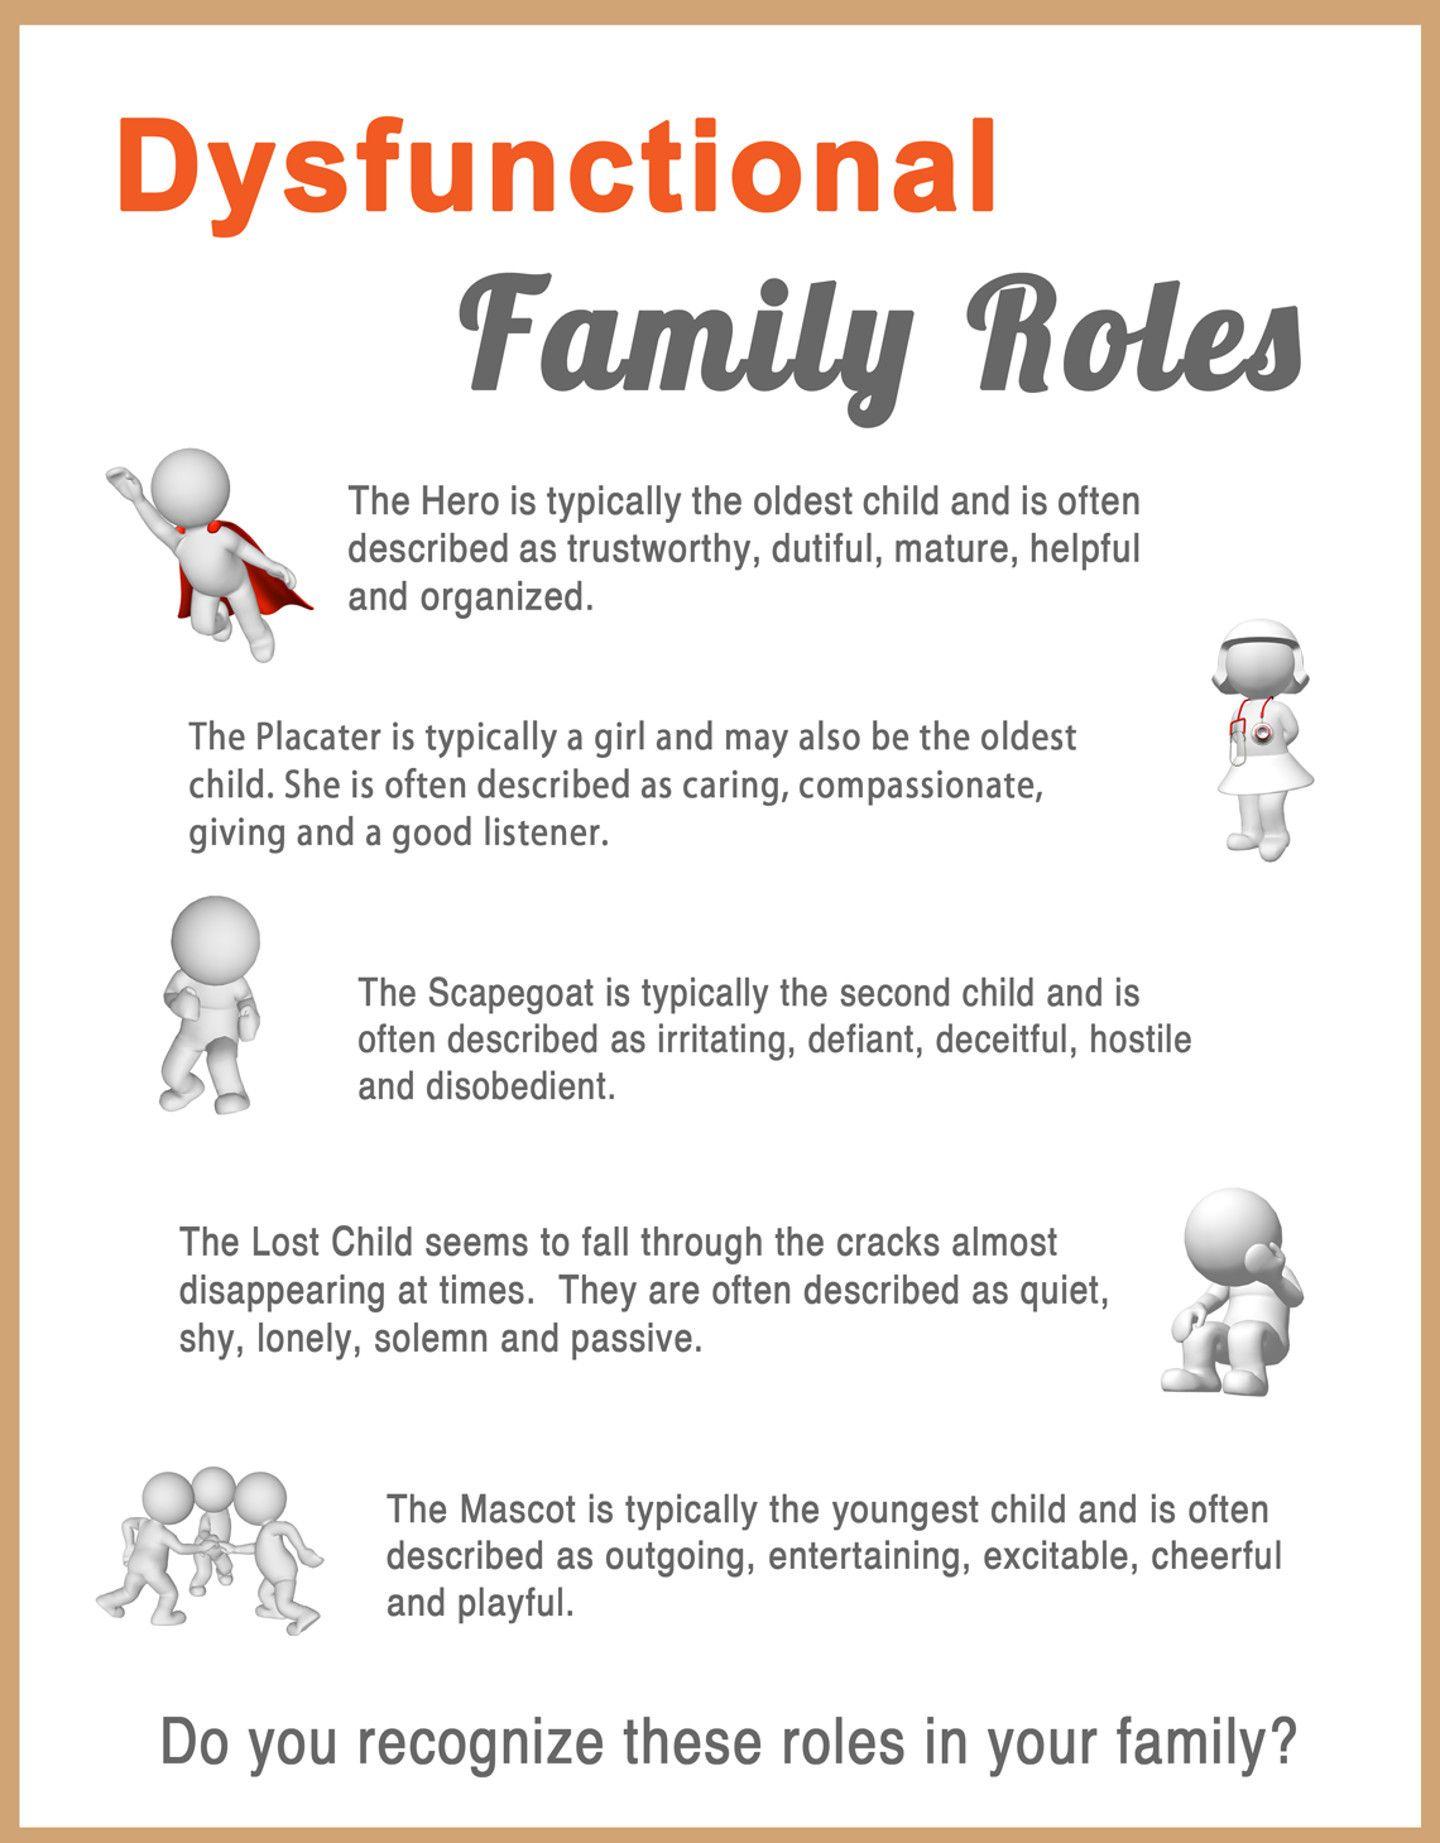 codependent relationships often start in the family parenting  codependent relationships often start in the family parenting styles can lead to dysfunctional family roles